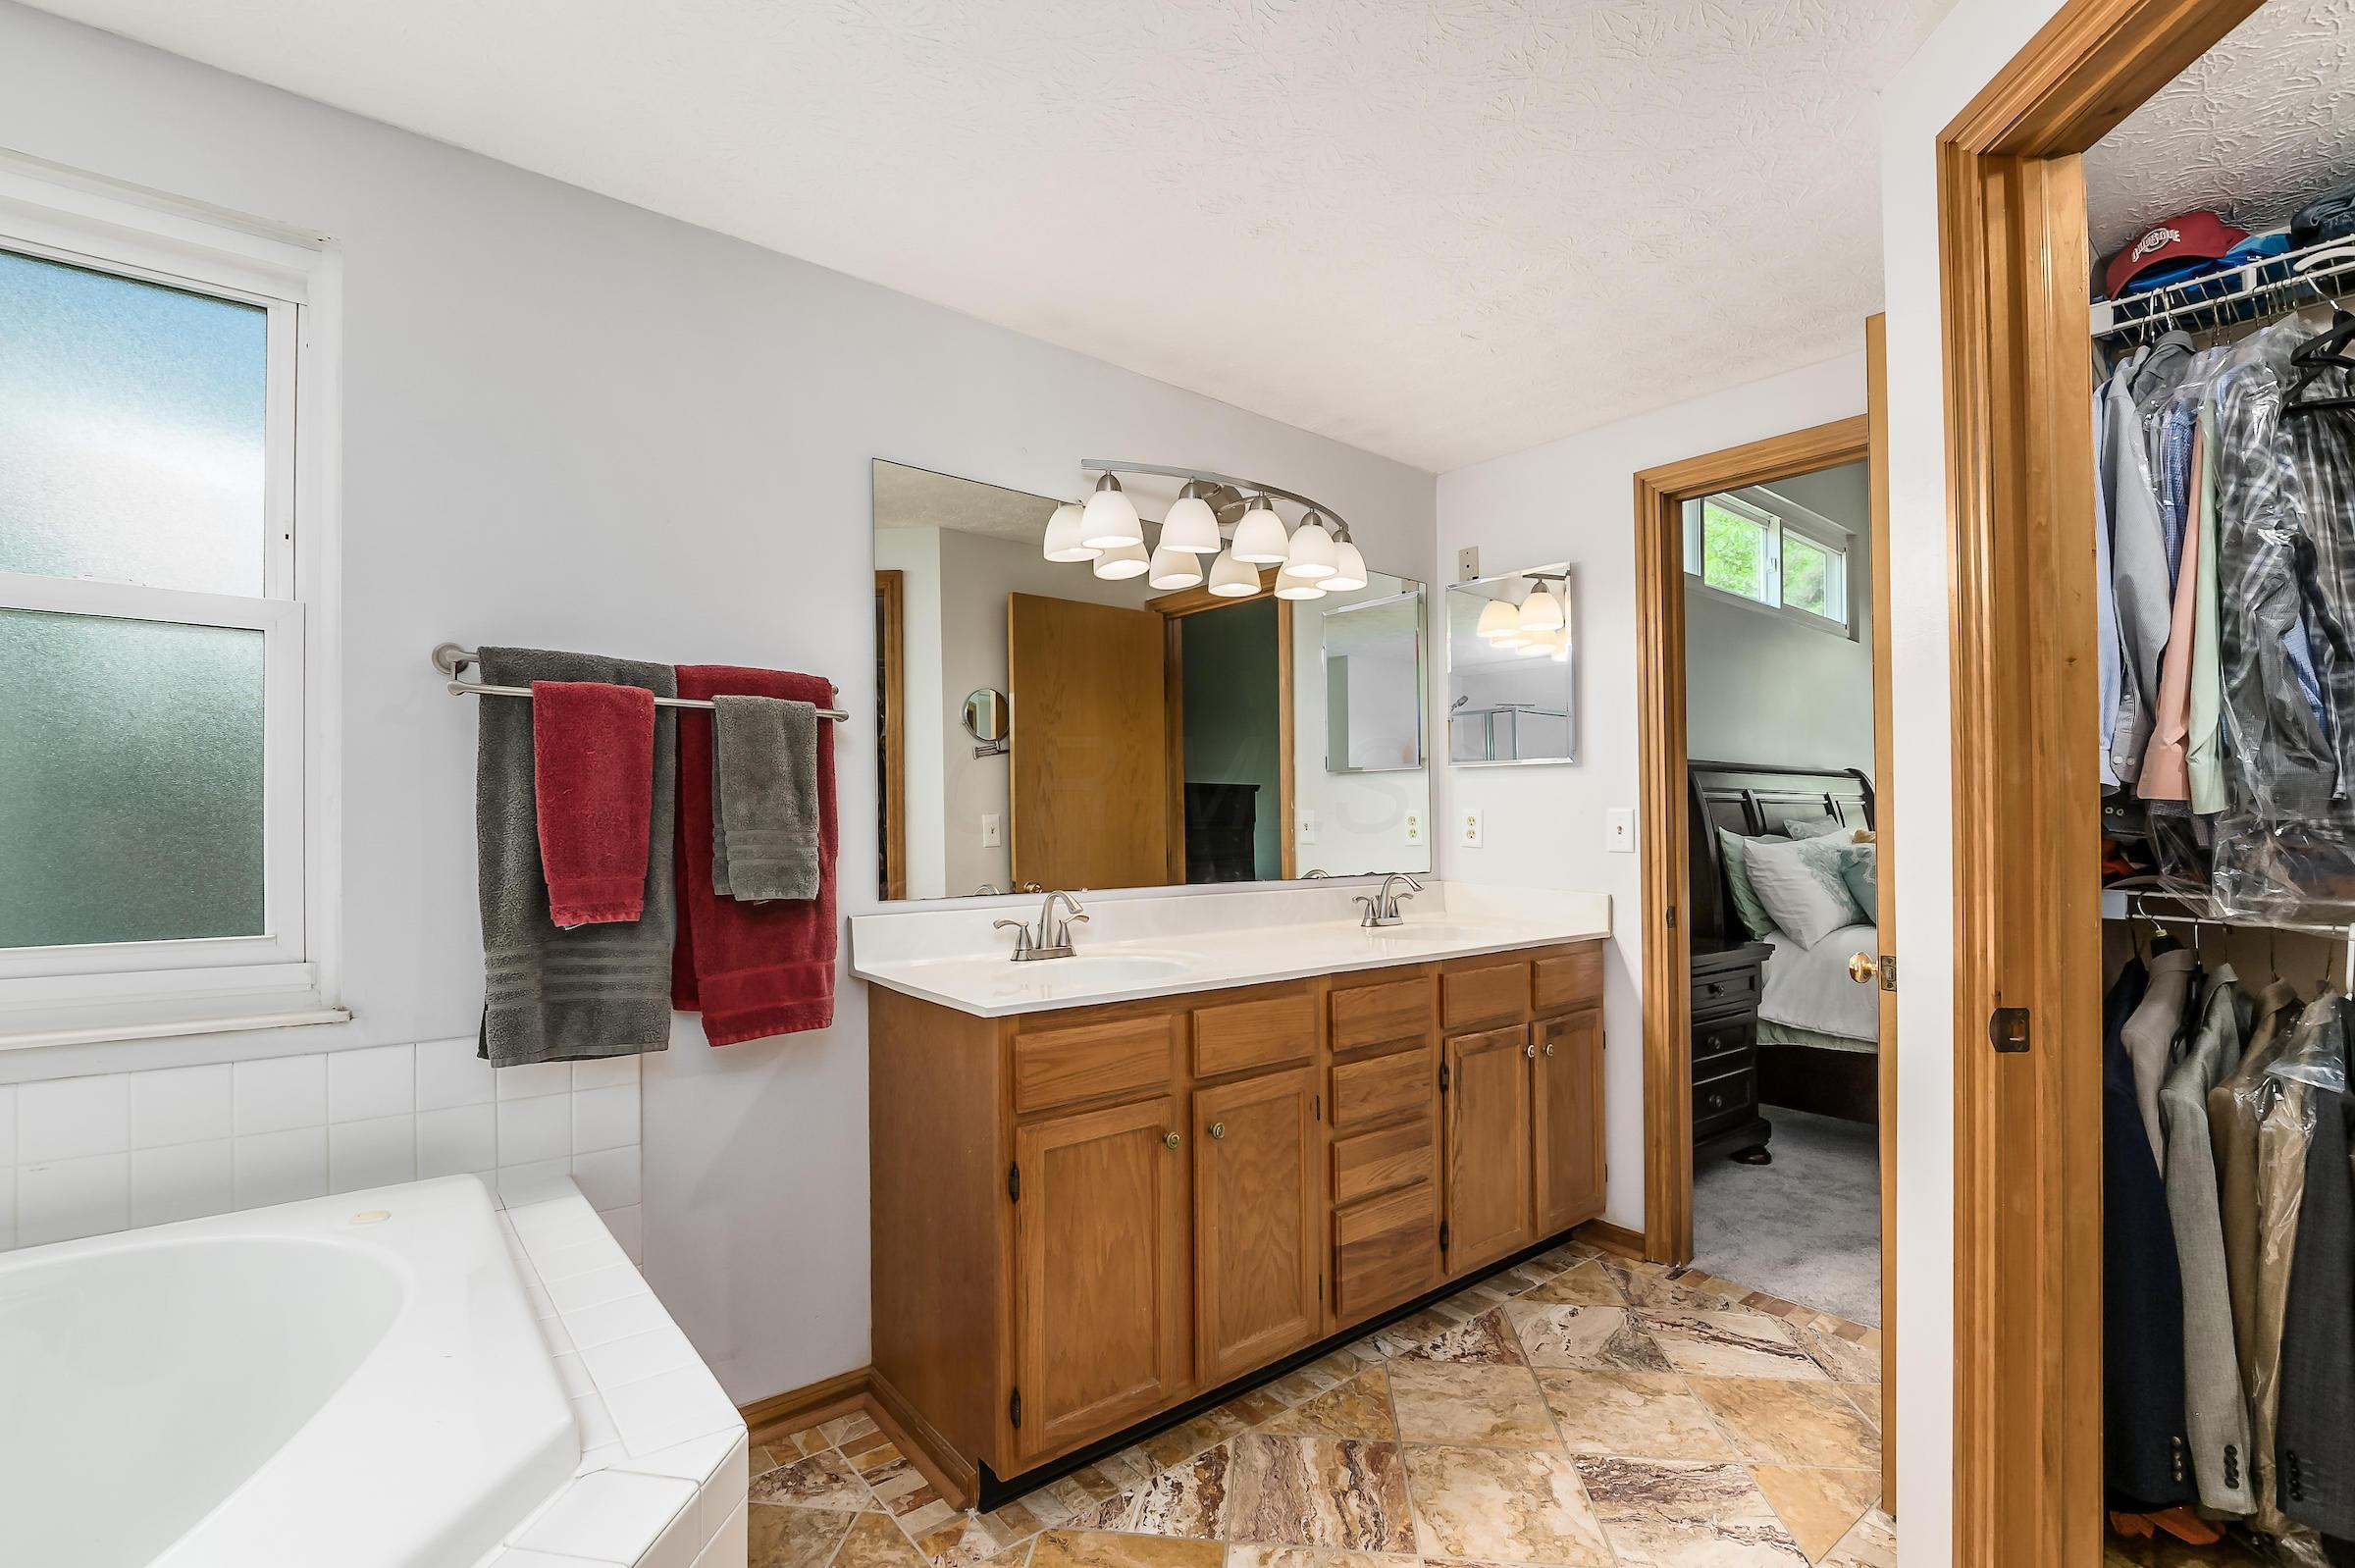 4398 Chukbuk Court, Hilliard, Ohio 43026, 4 Bedrooms Bedrooms, ,3 BathroomsBathrooms,Residential,For Sale,Chukbuk,220020589